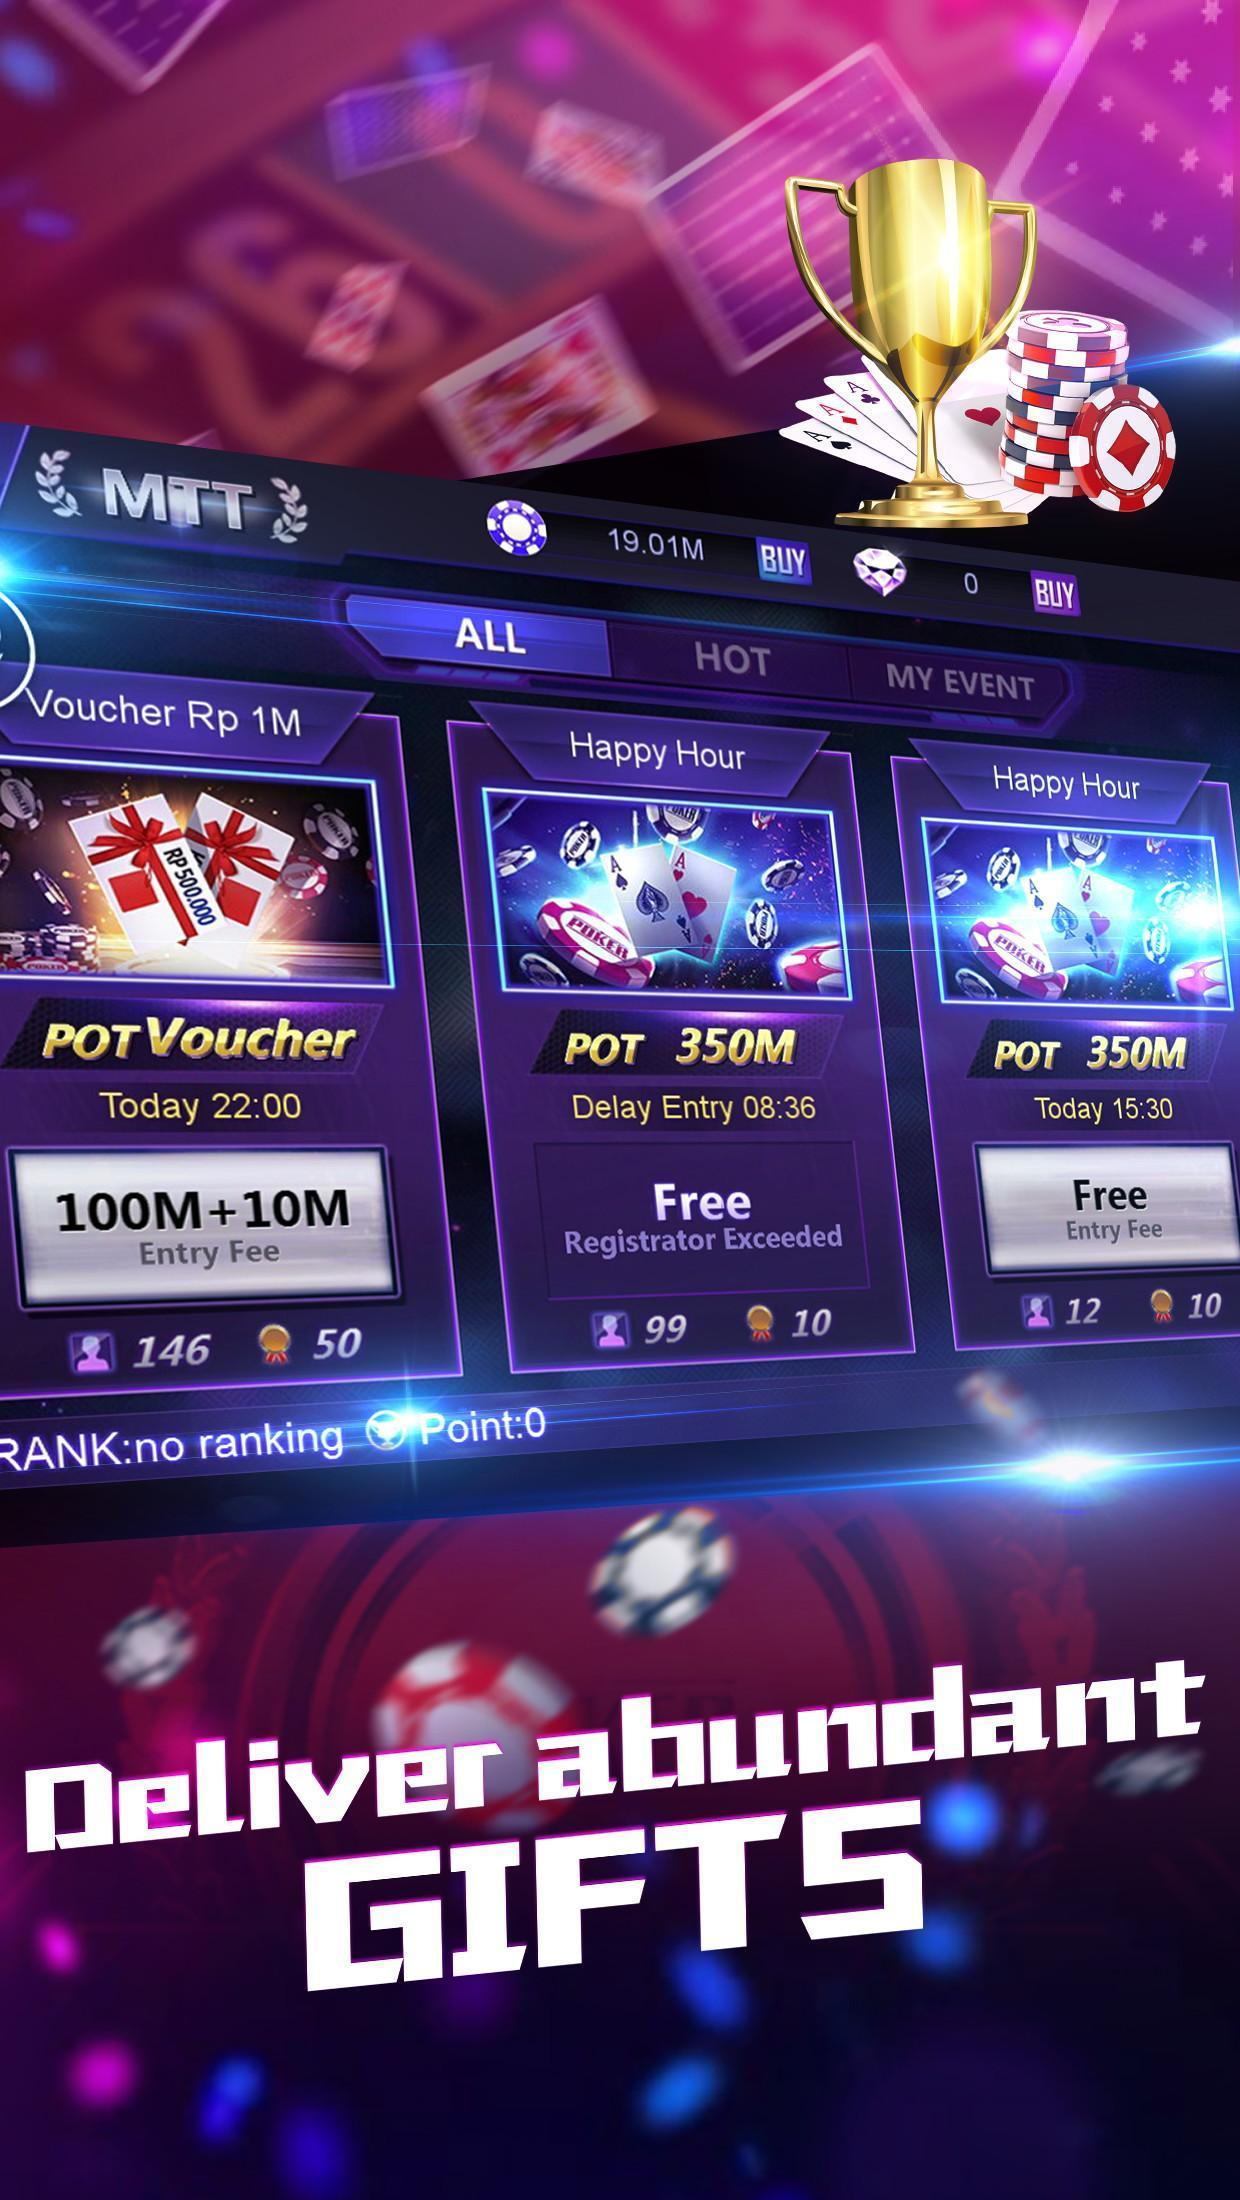 Royal Poker Pulsa Texas For Android Apk Download